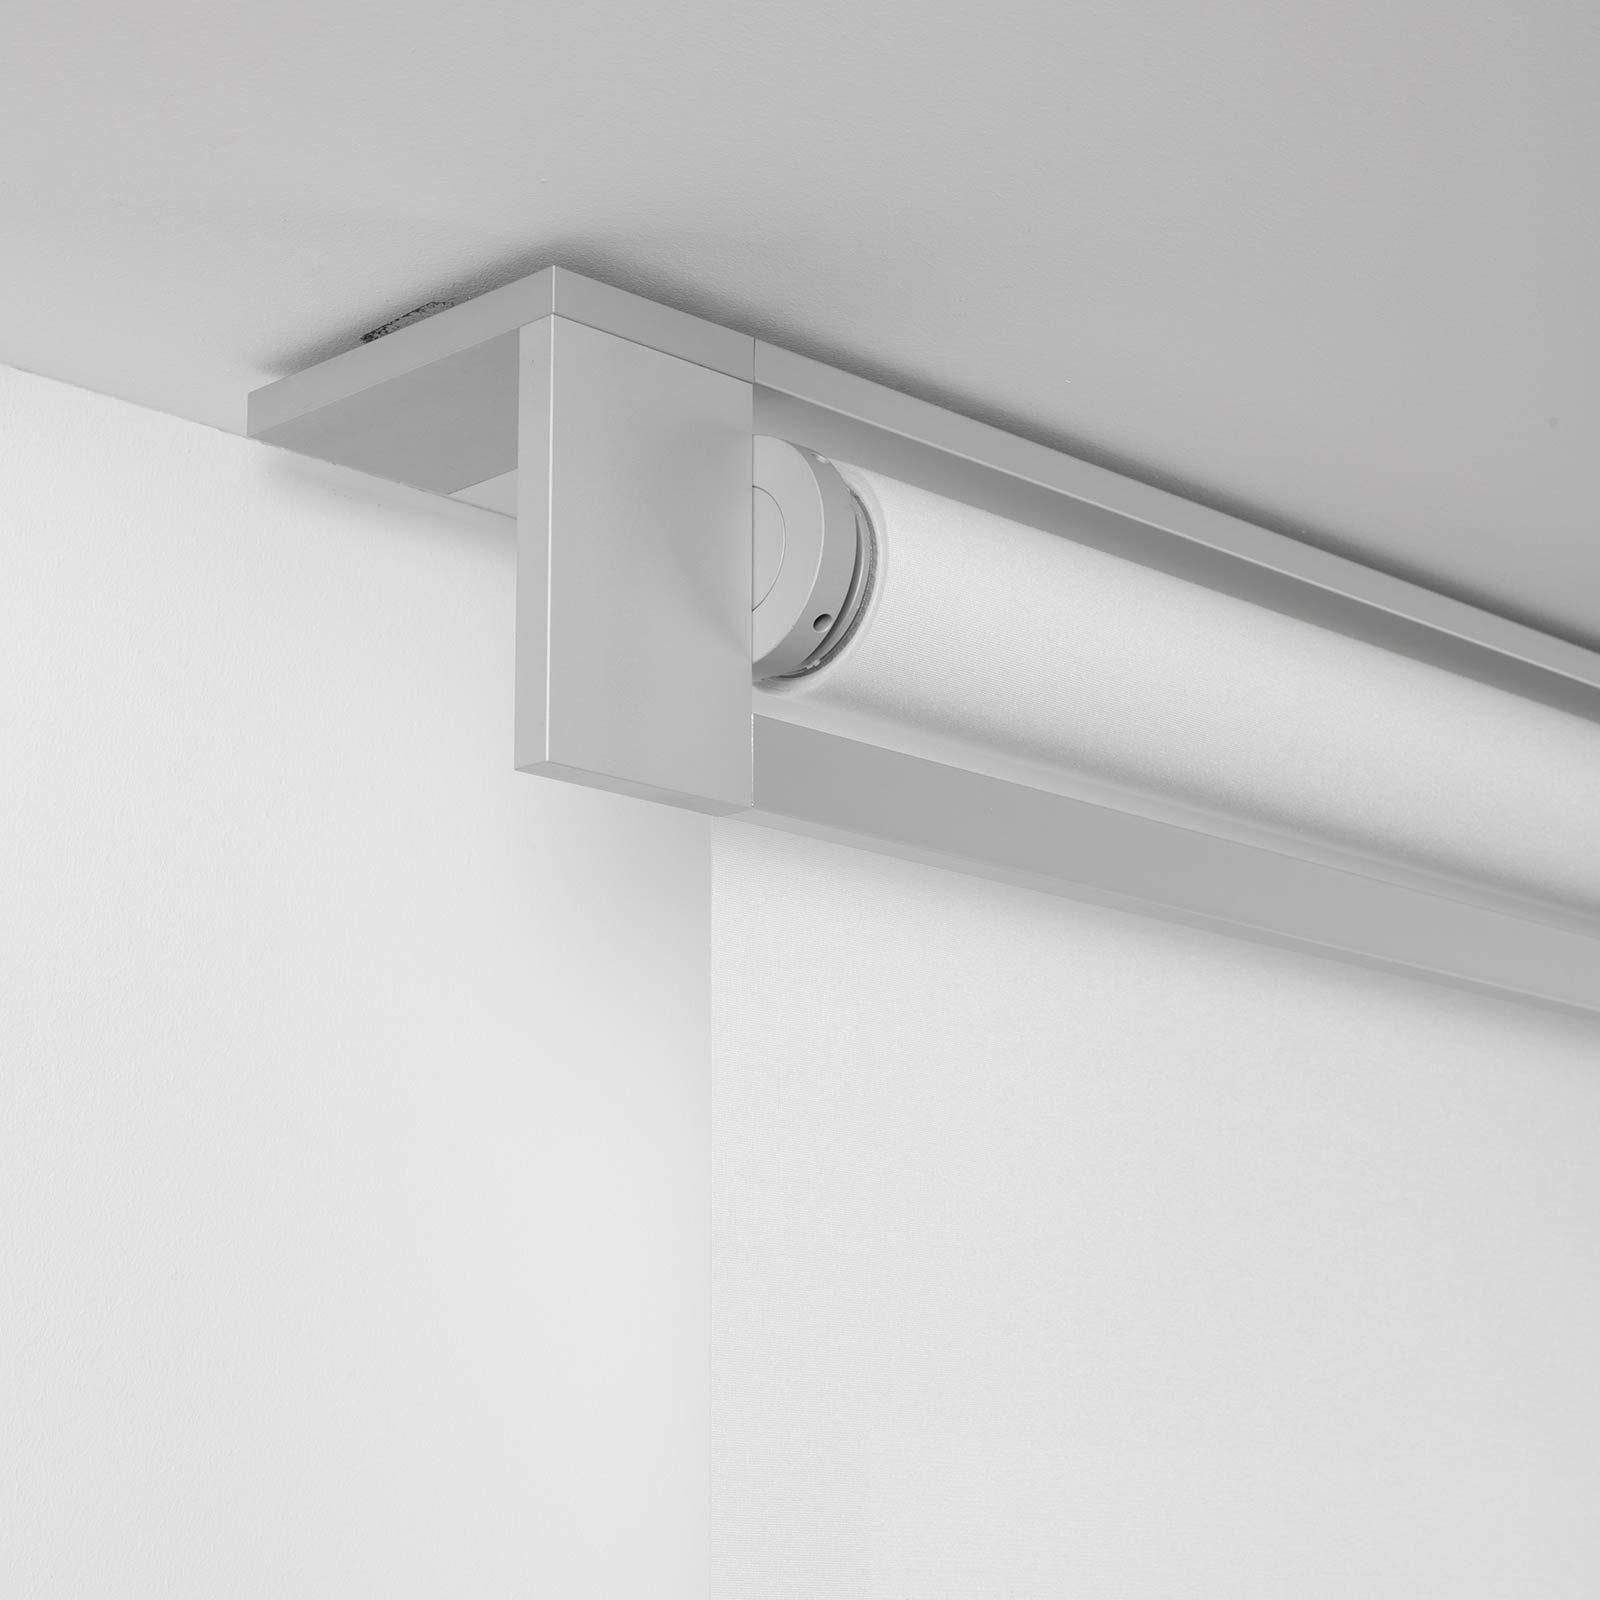 Frame Line — A soffitto